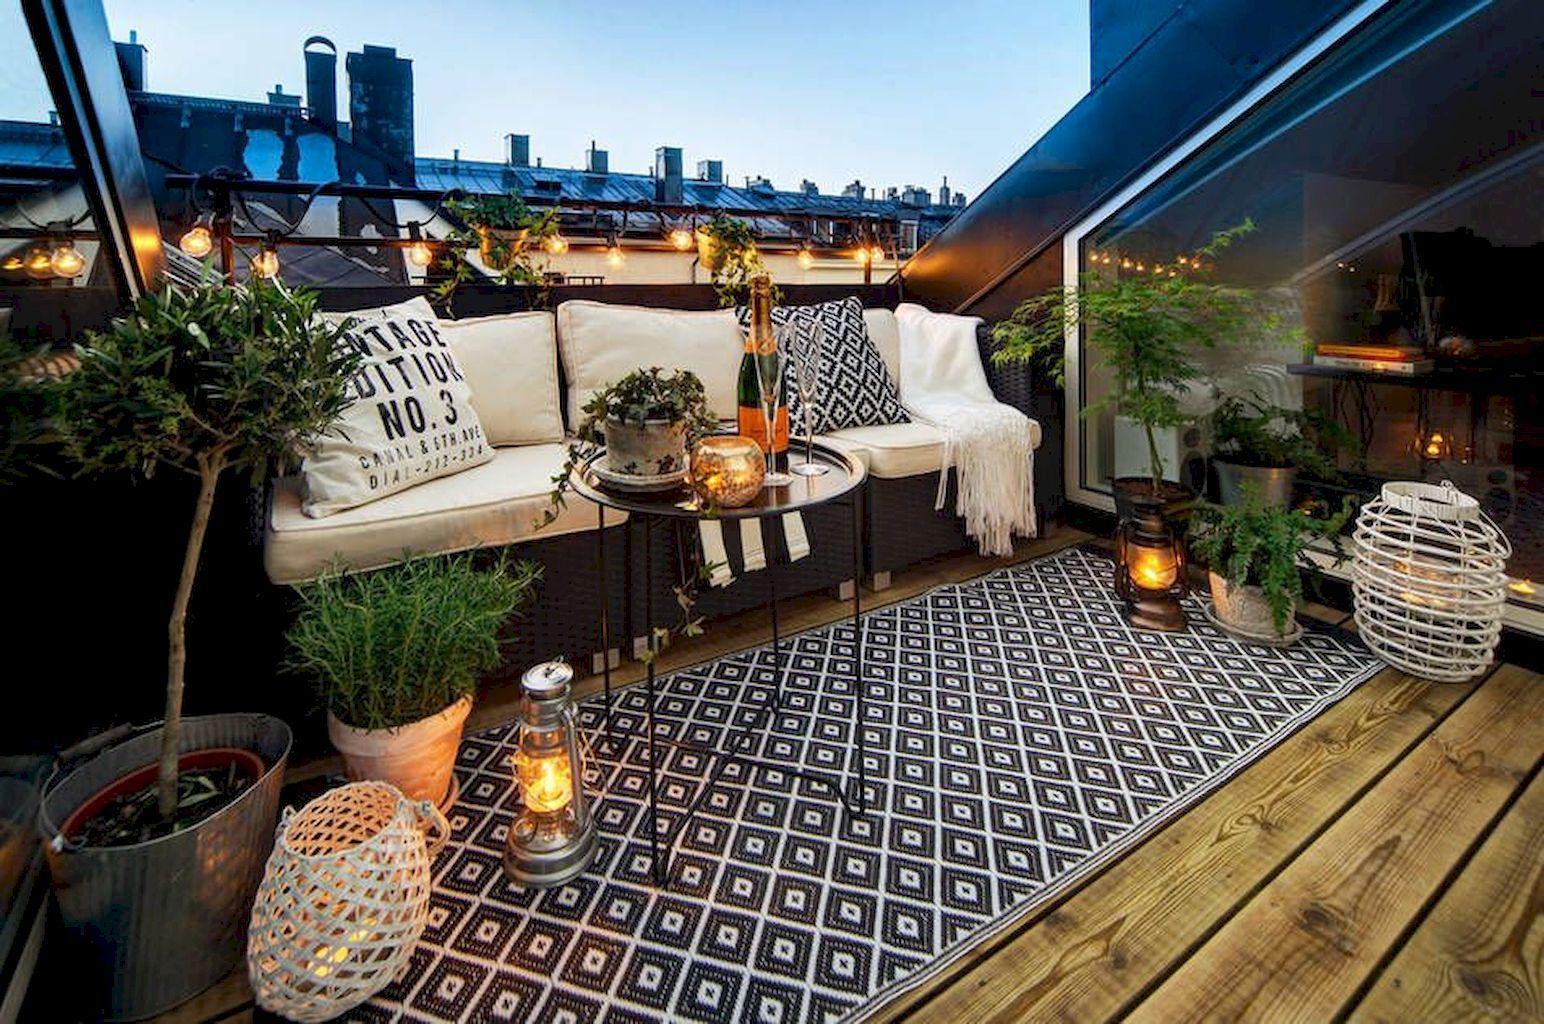 75 Small Apartment Balcony Decorating Ideas Setyouroom Com Roof Terrace Design Balcony Decor Apartment Balcony Decorating